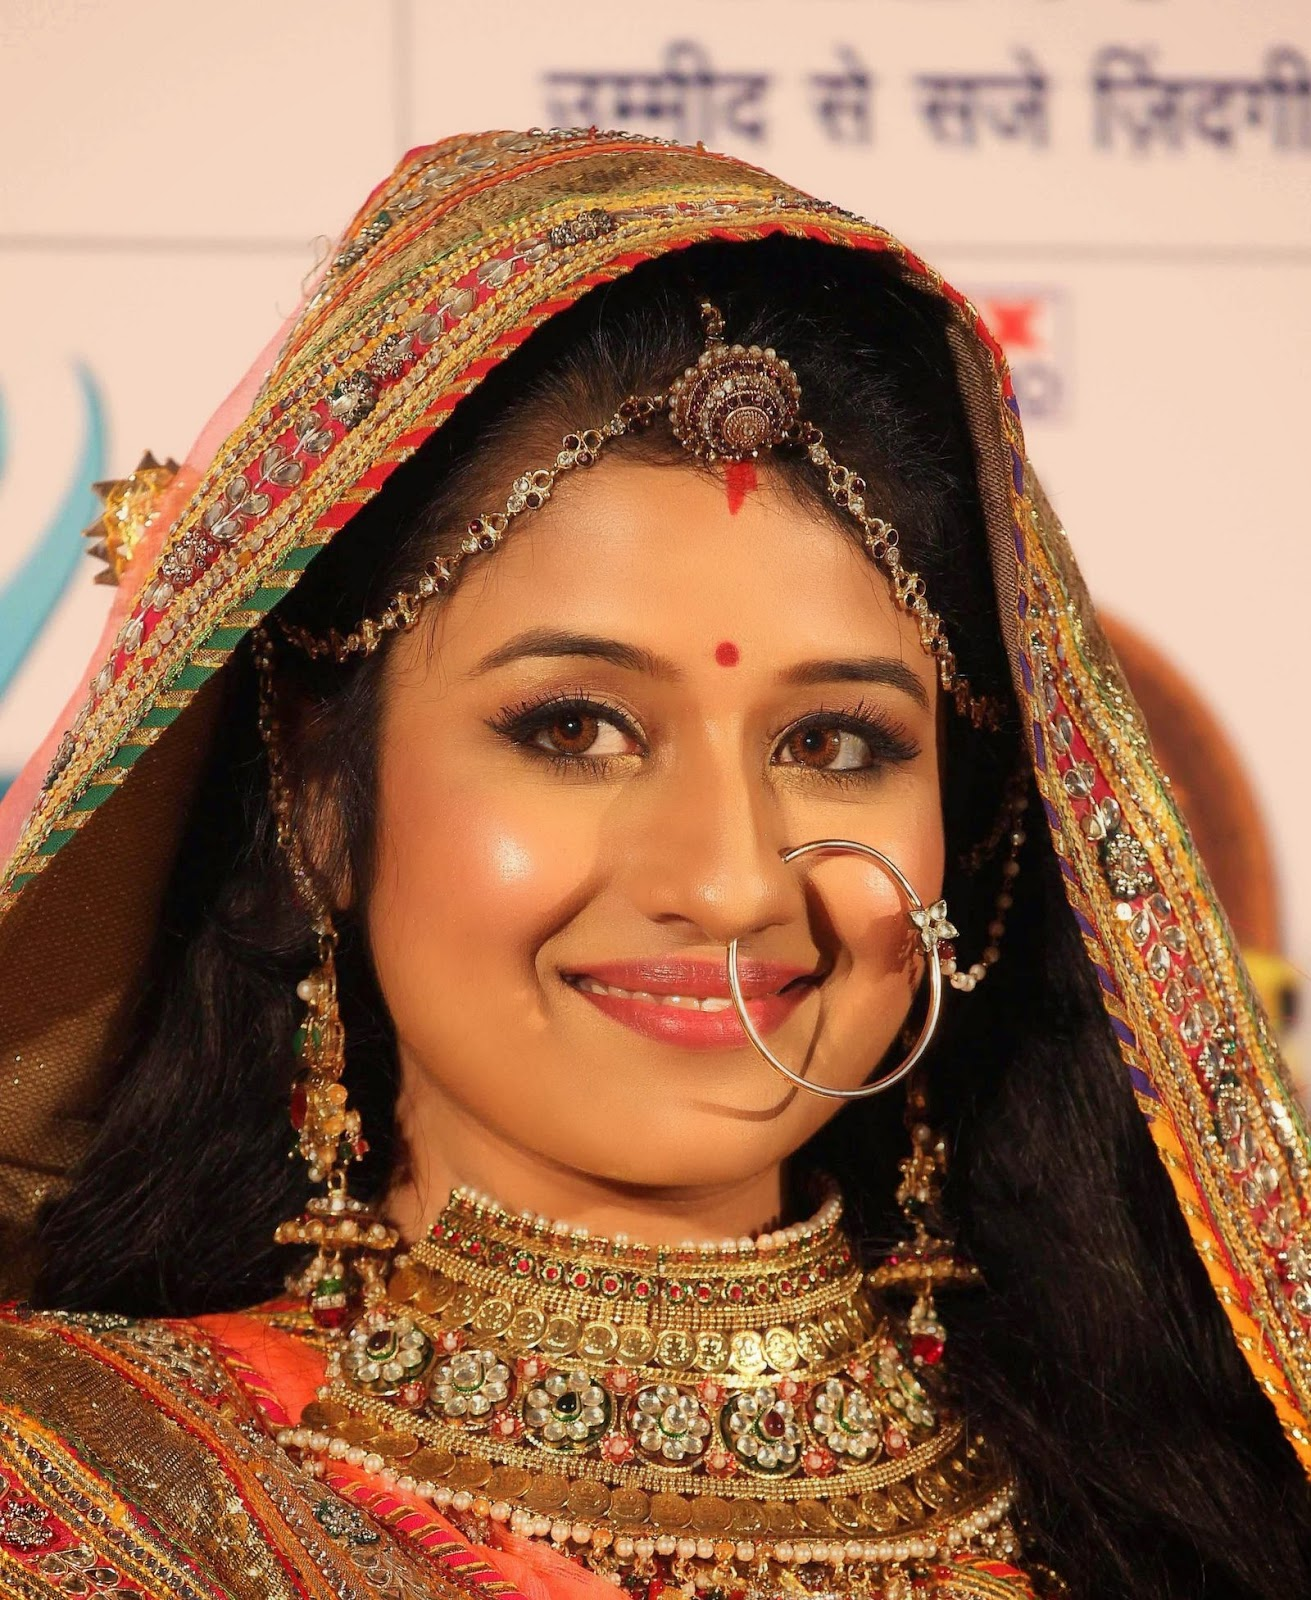 Paridhi Sharma Hot Latest Full HD Images Pics Photoshoots